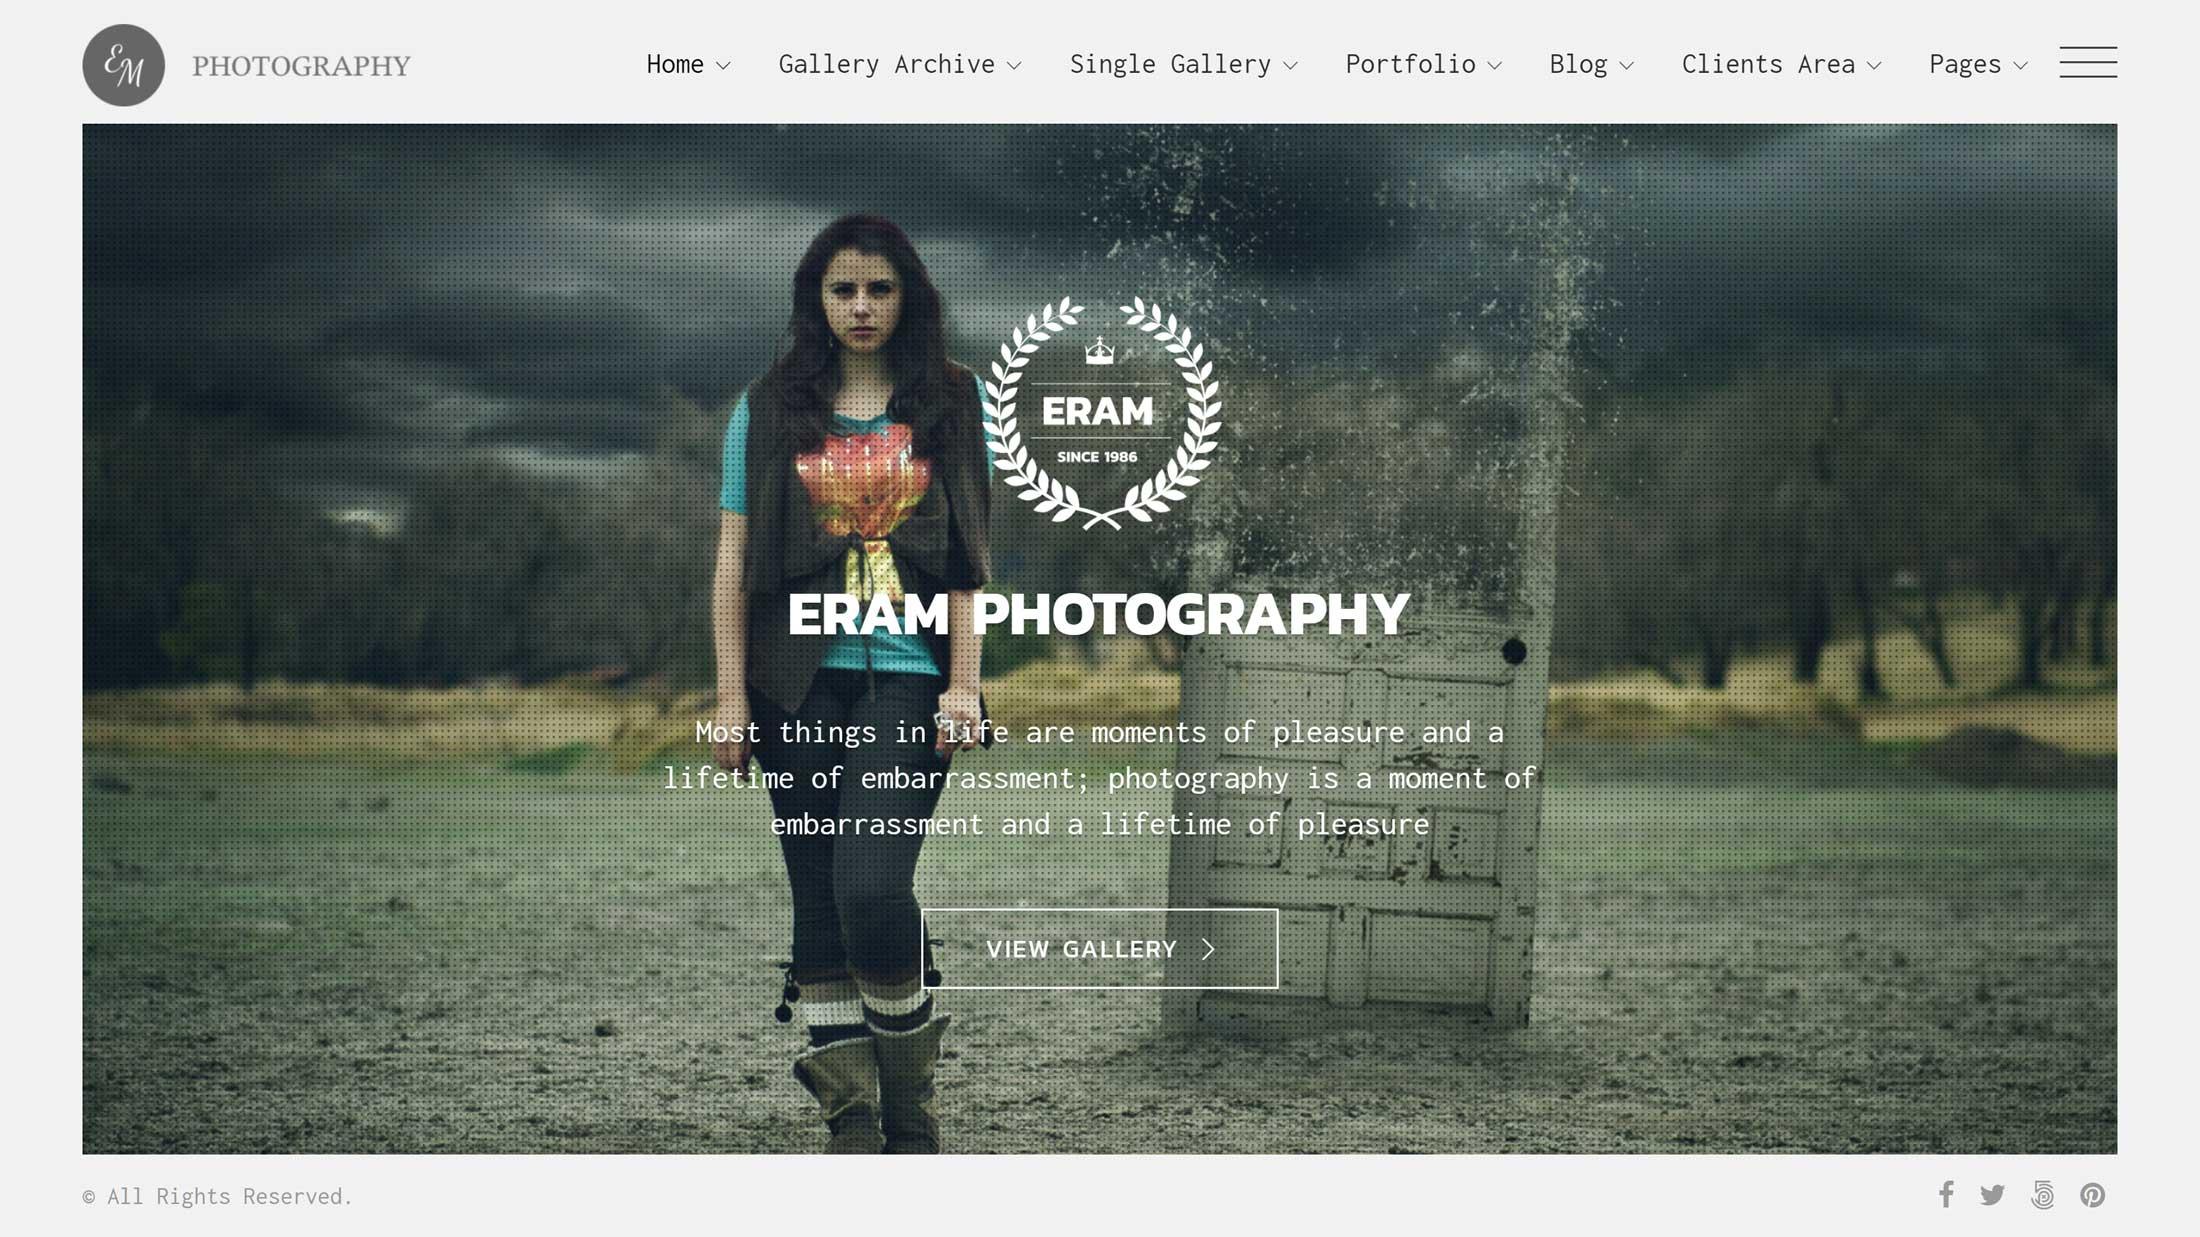 Eram Theme Review: Create A Professional Photography Portfolio With WordPress